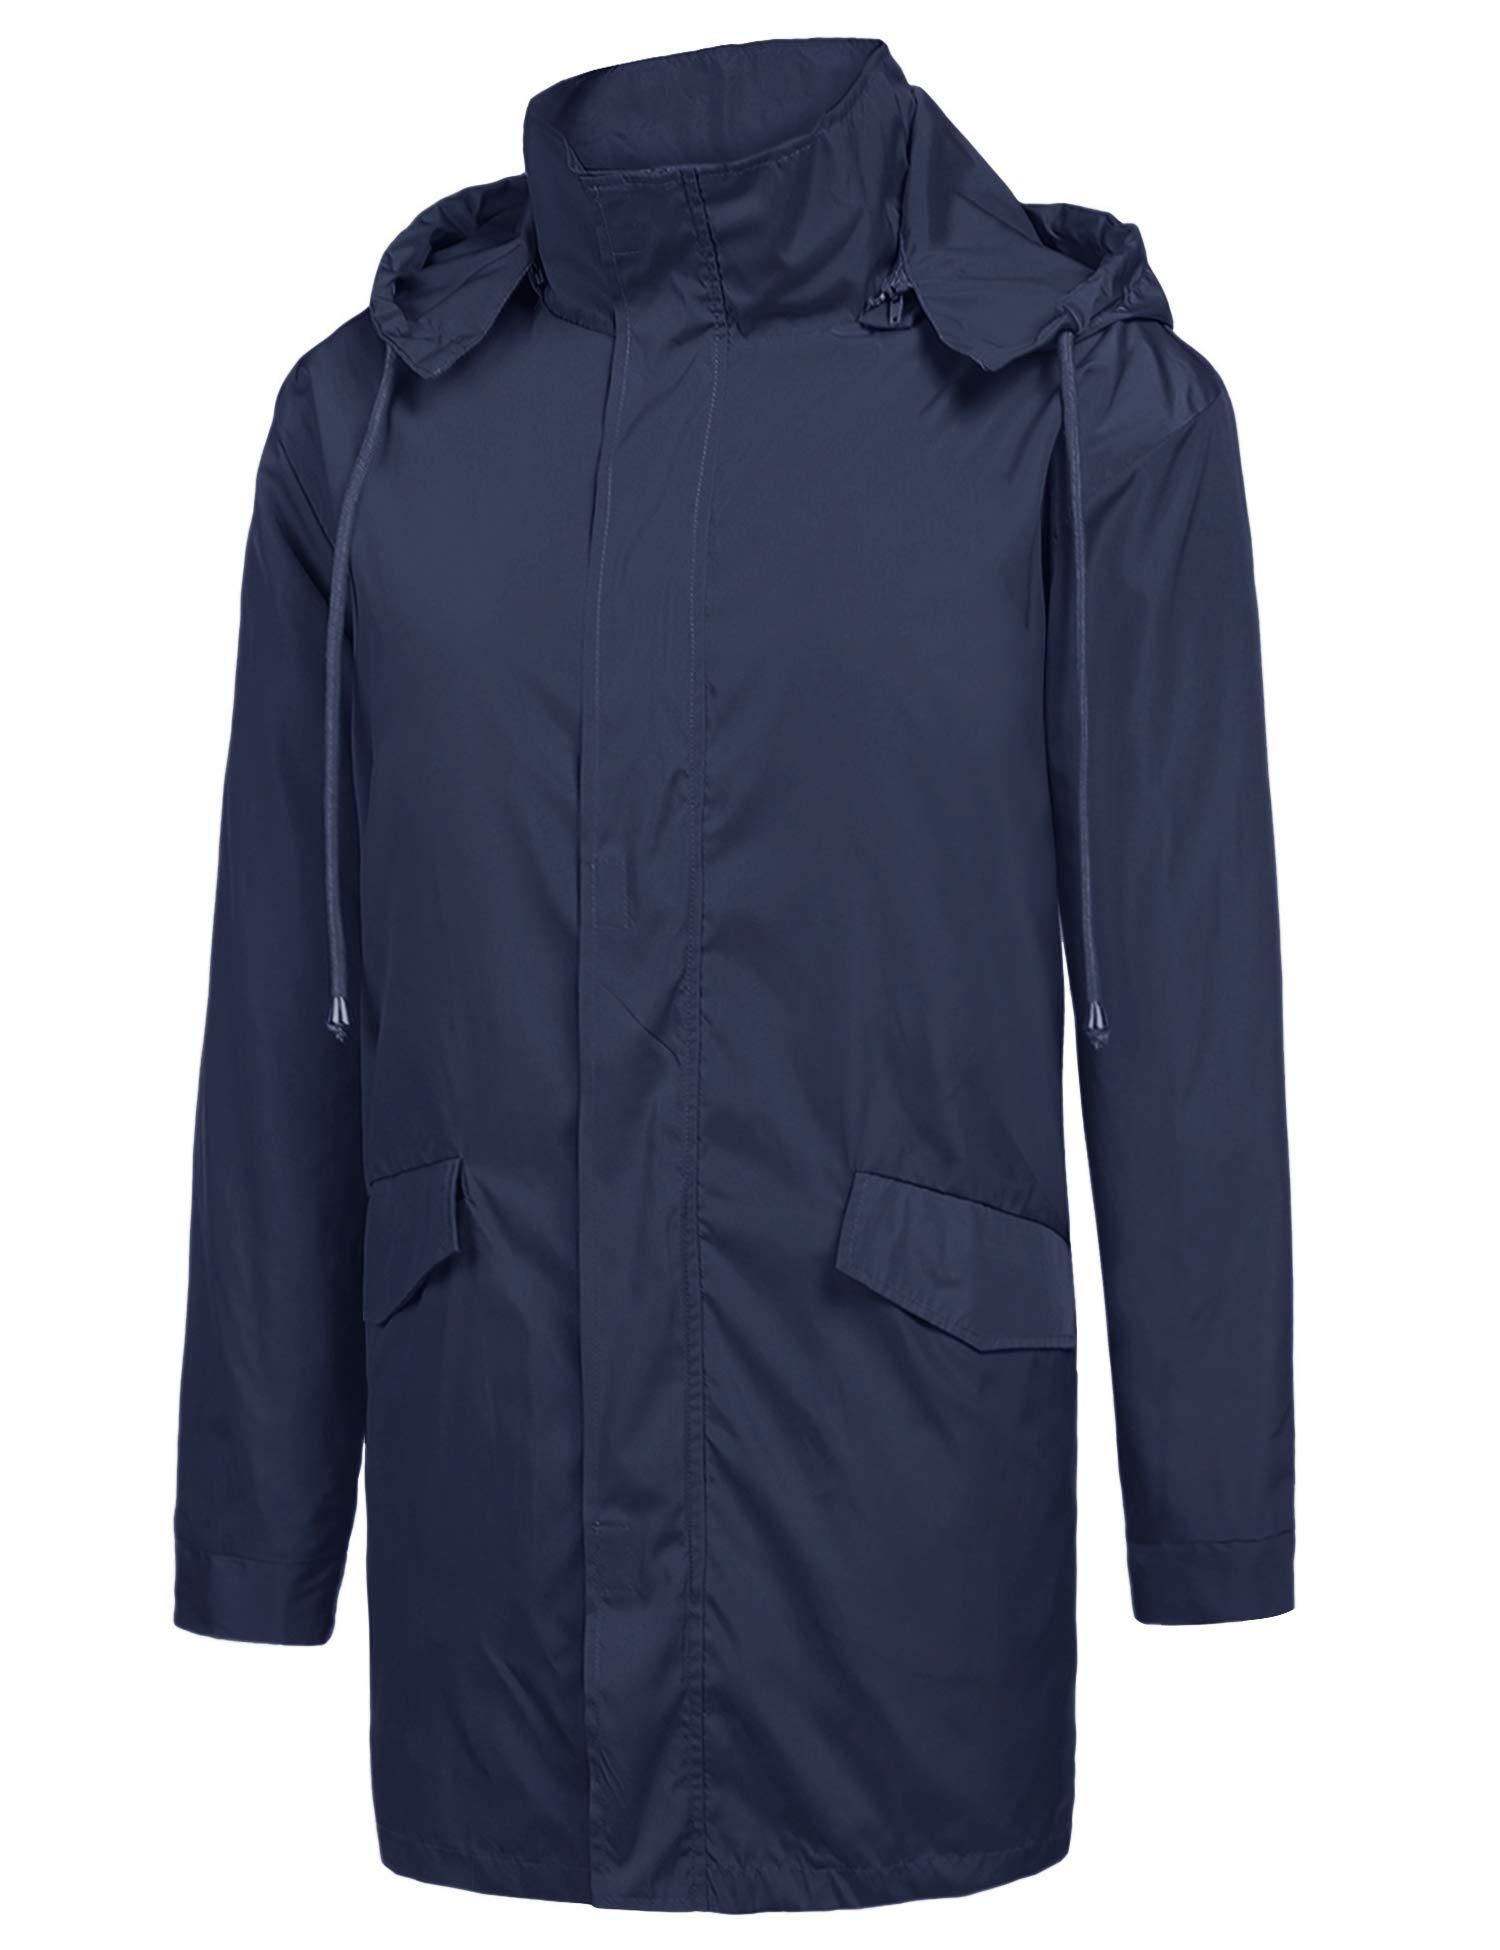 ZEGOLO Men's Raincoats Waterproof Windbreaker Lightweight Active Outdoor Full Zip Hooded Long Rain Jacket Trench Coats Navy Blue X-Large by ZEGOLO